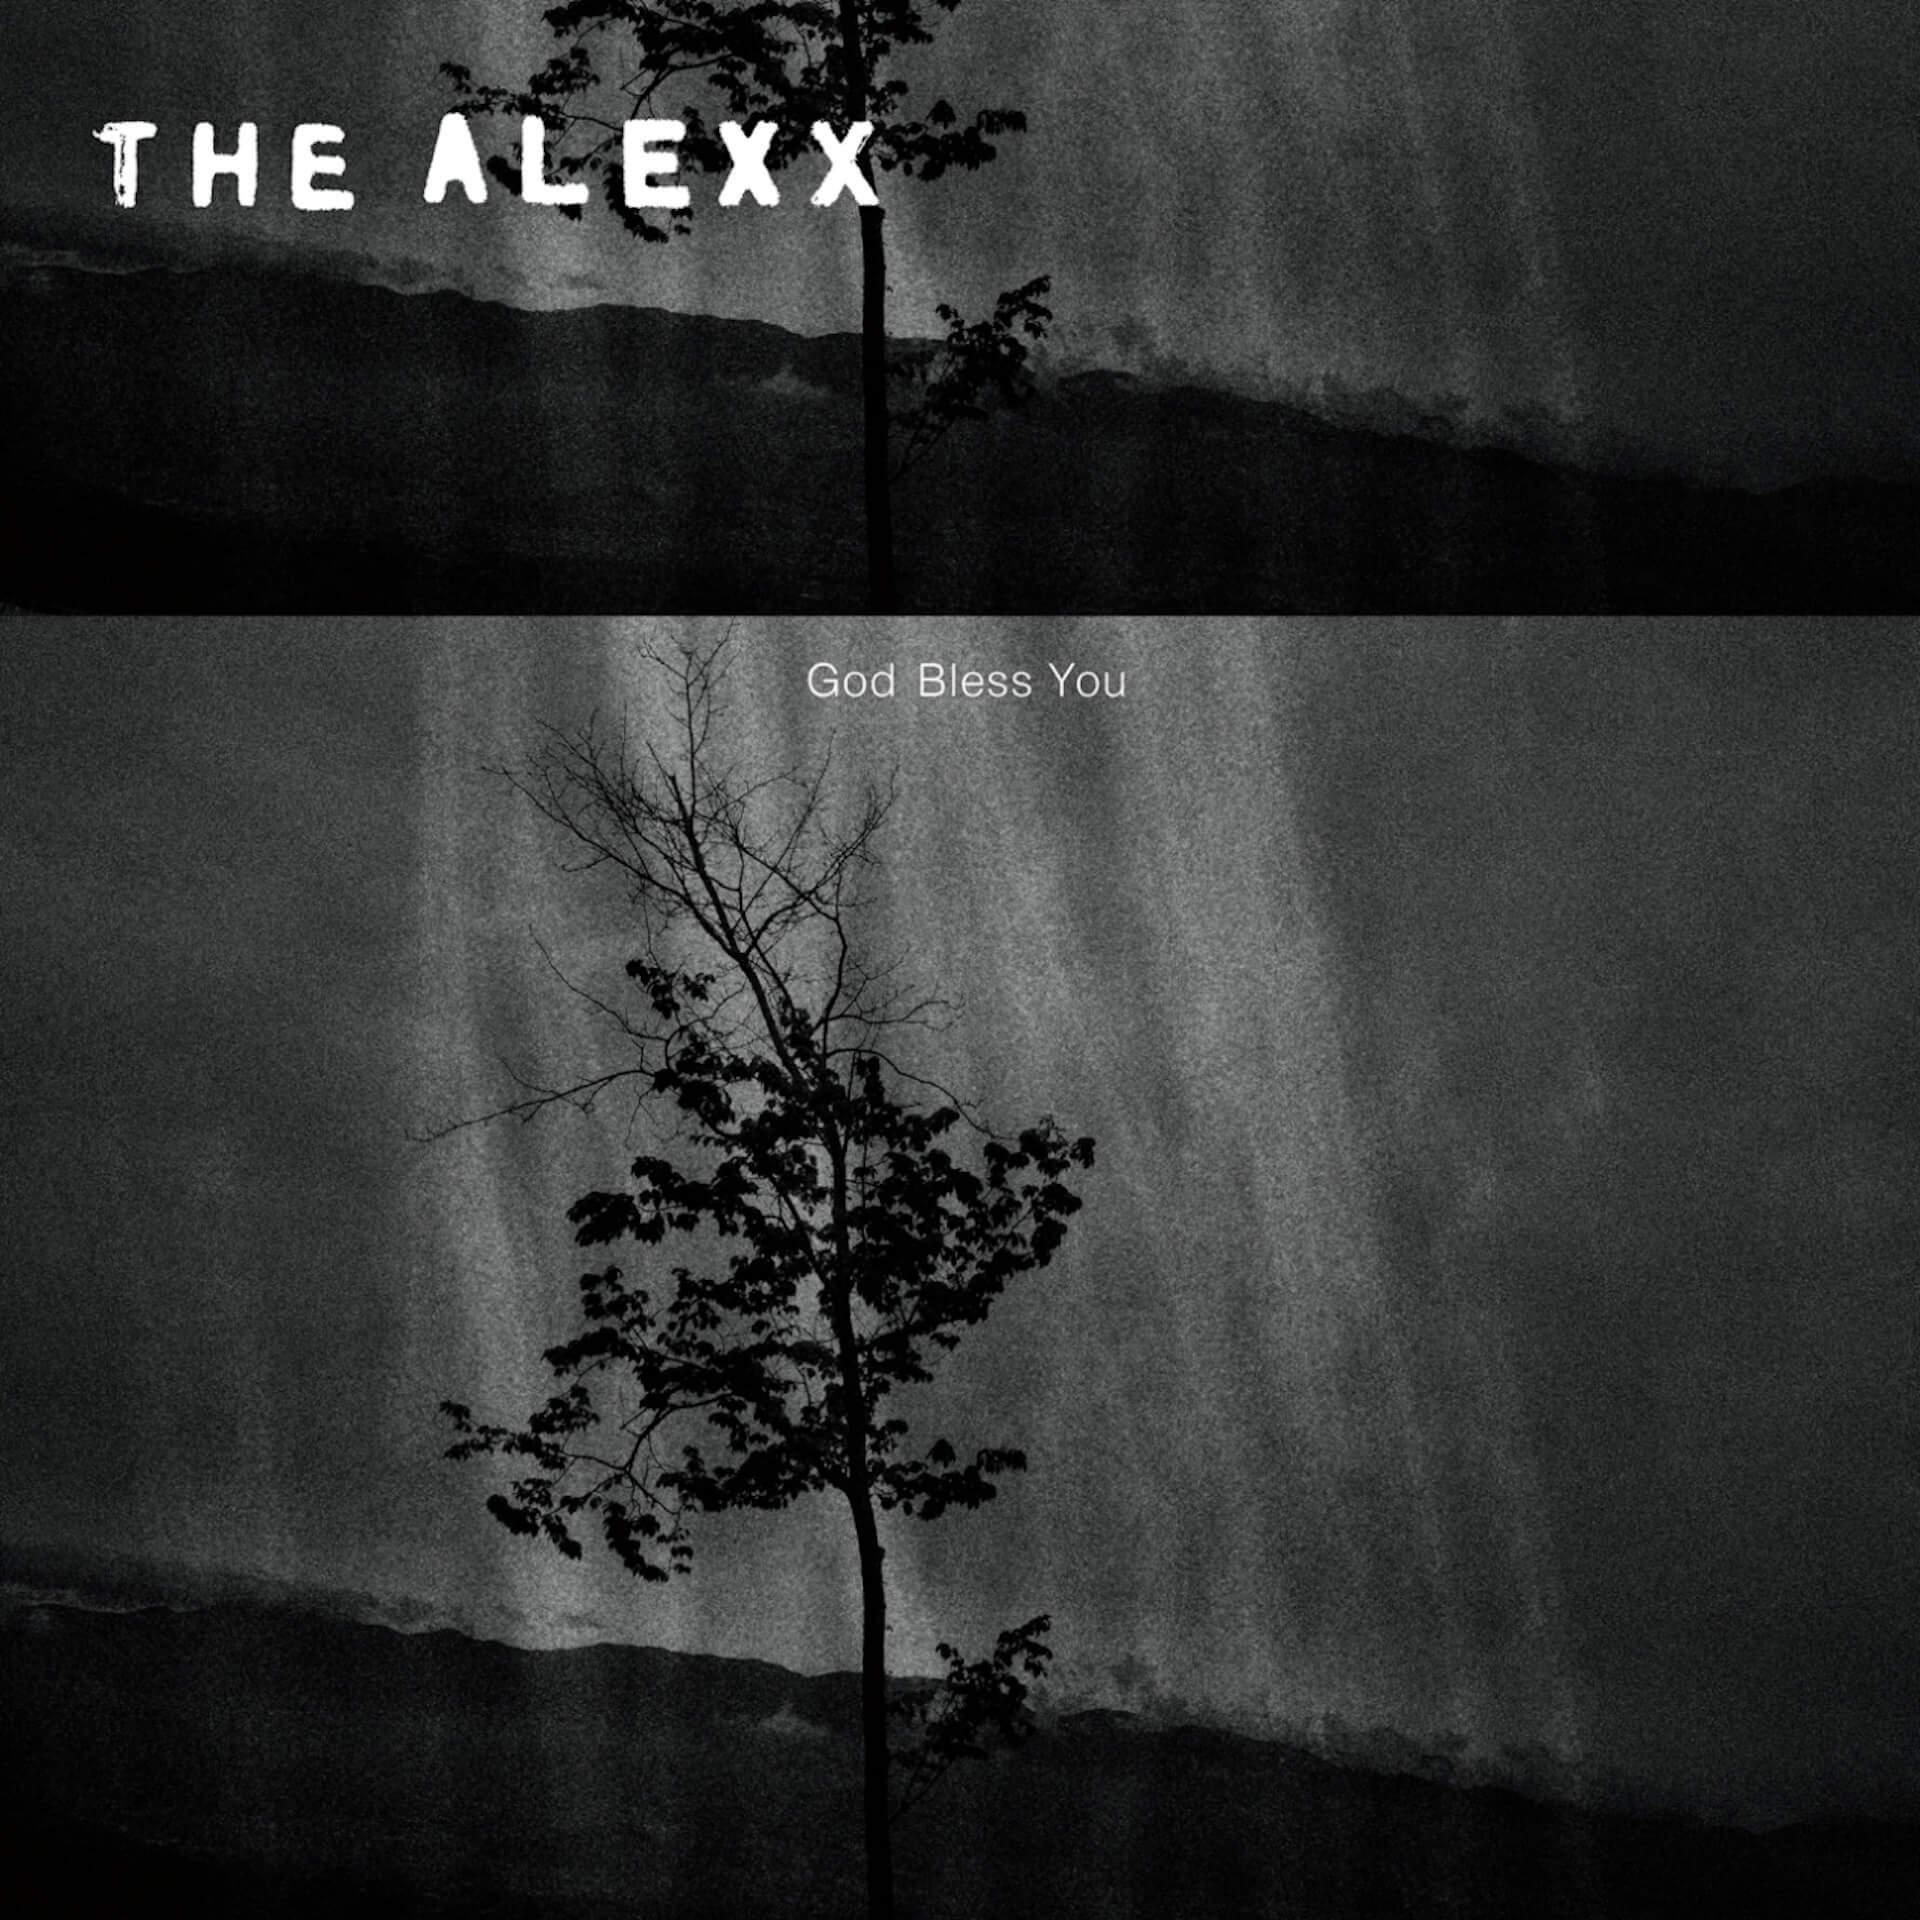 2ndアルバム『God Bless You』をリリースするTHE ALEXXがSUPER DOMMUNEで全曲ライブに挑戦! music210803_thealexx_superdommune_3